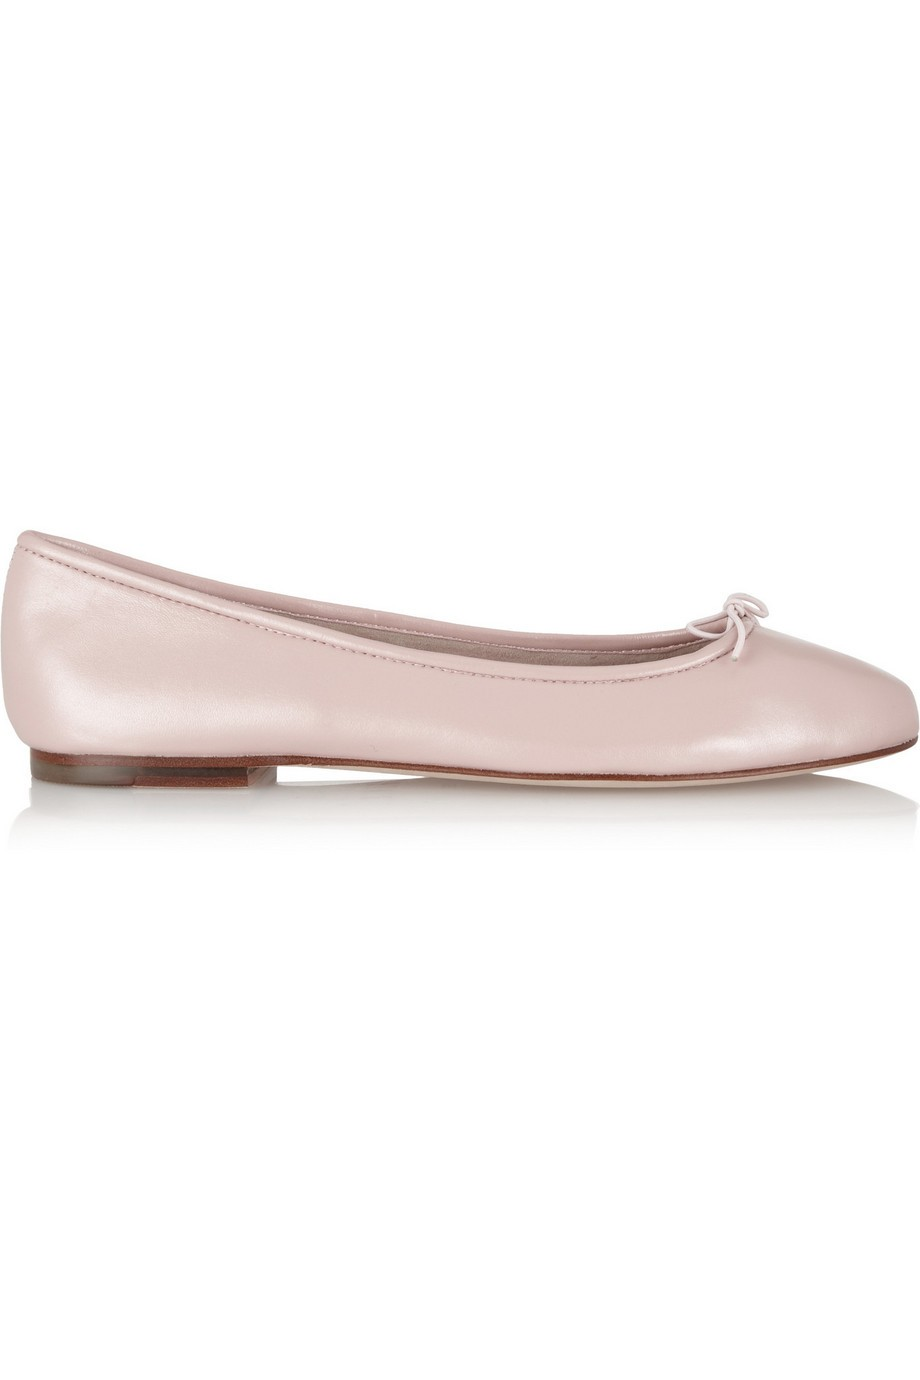 Fonteyn leather ballet flats